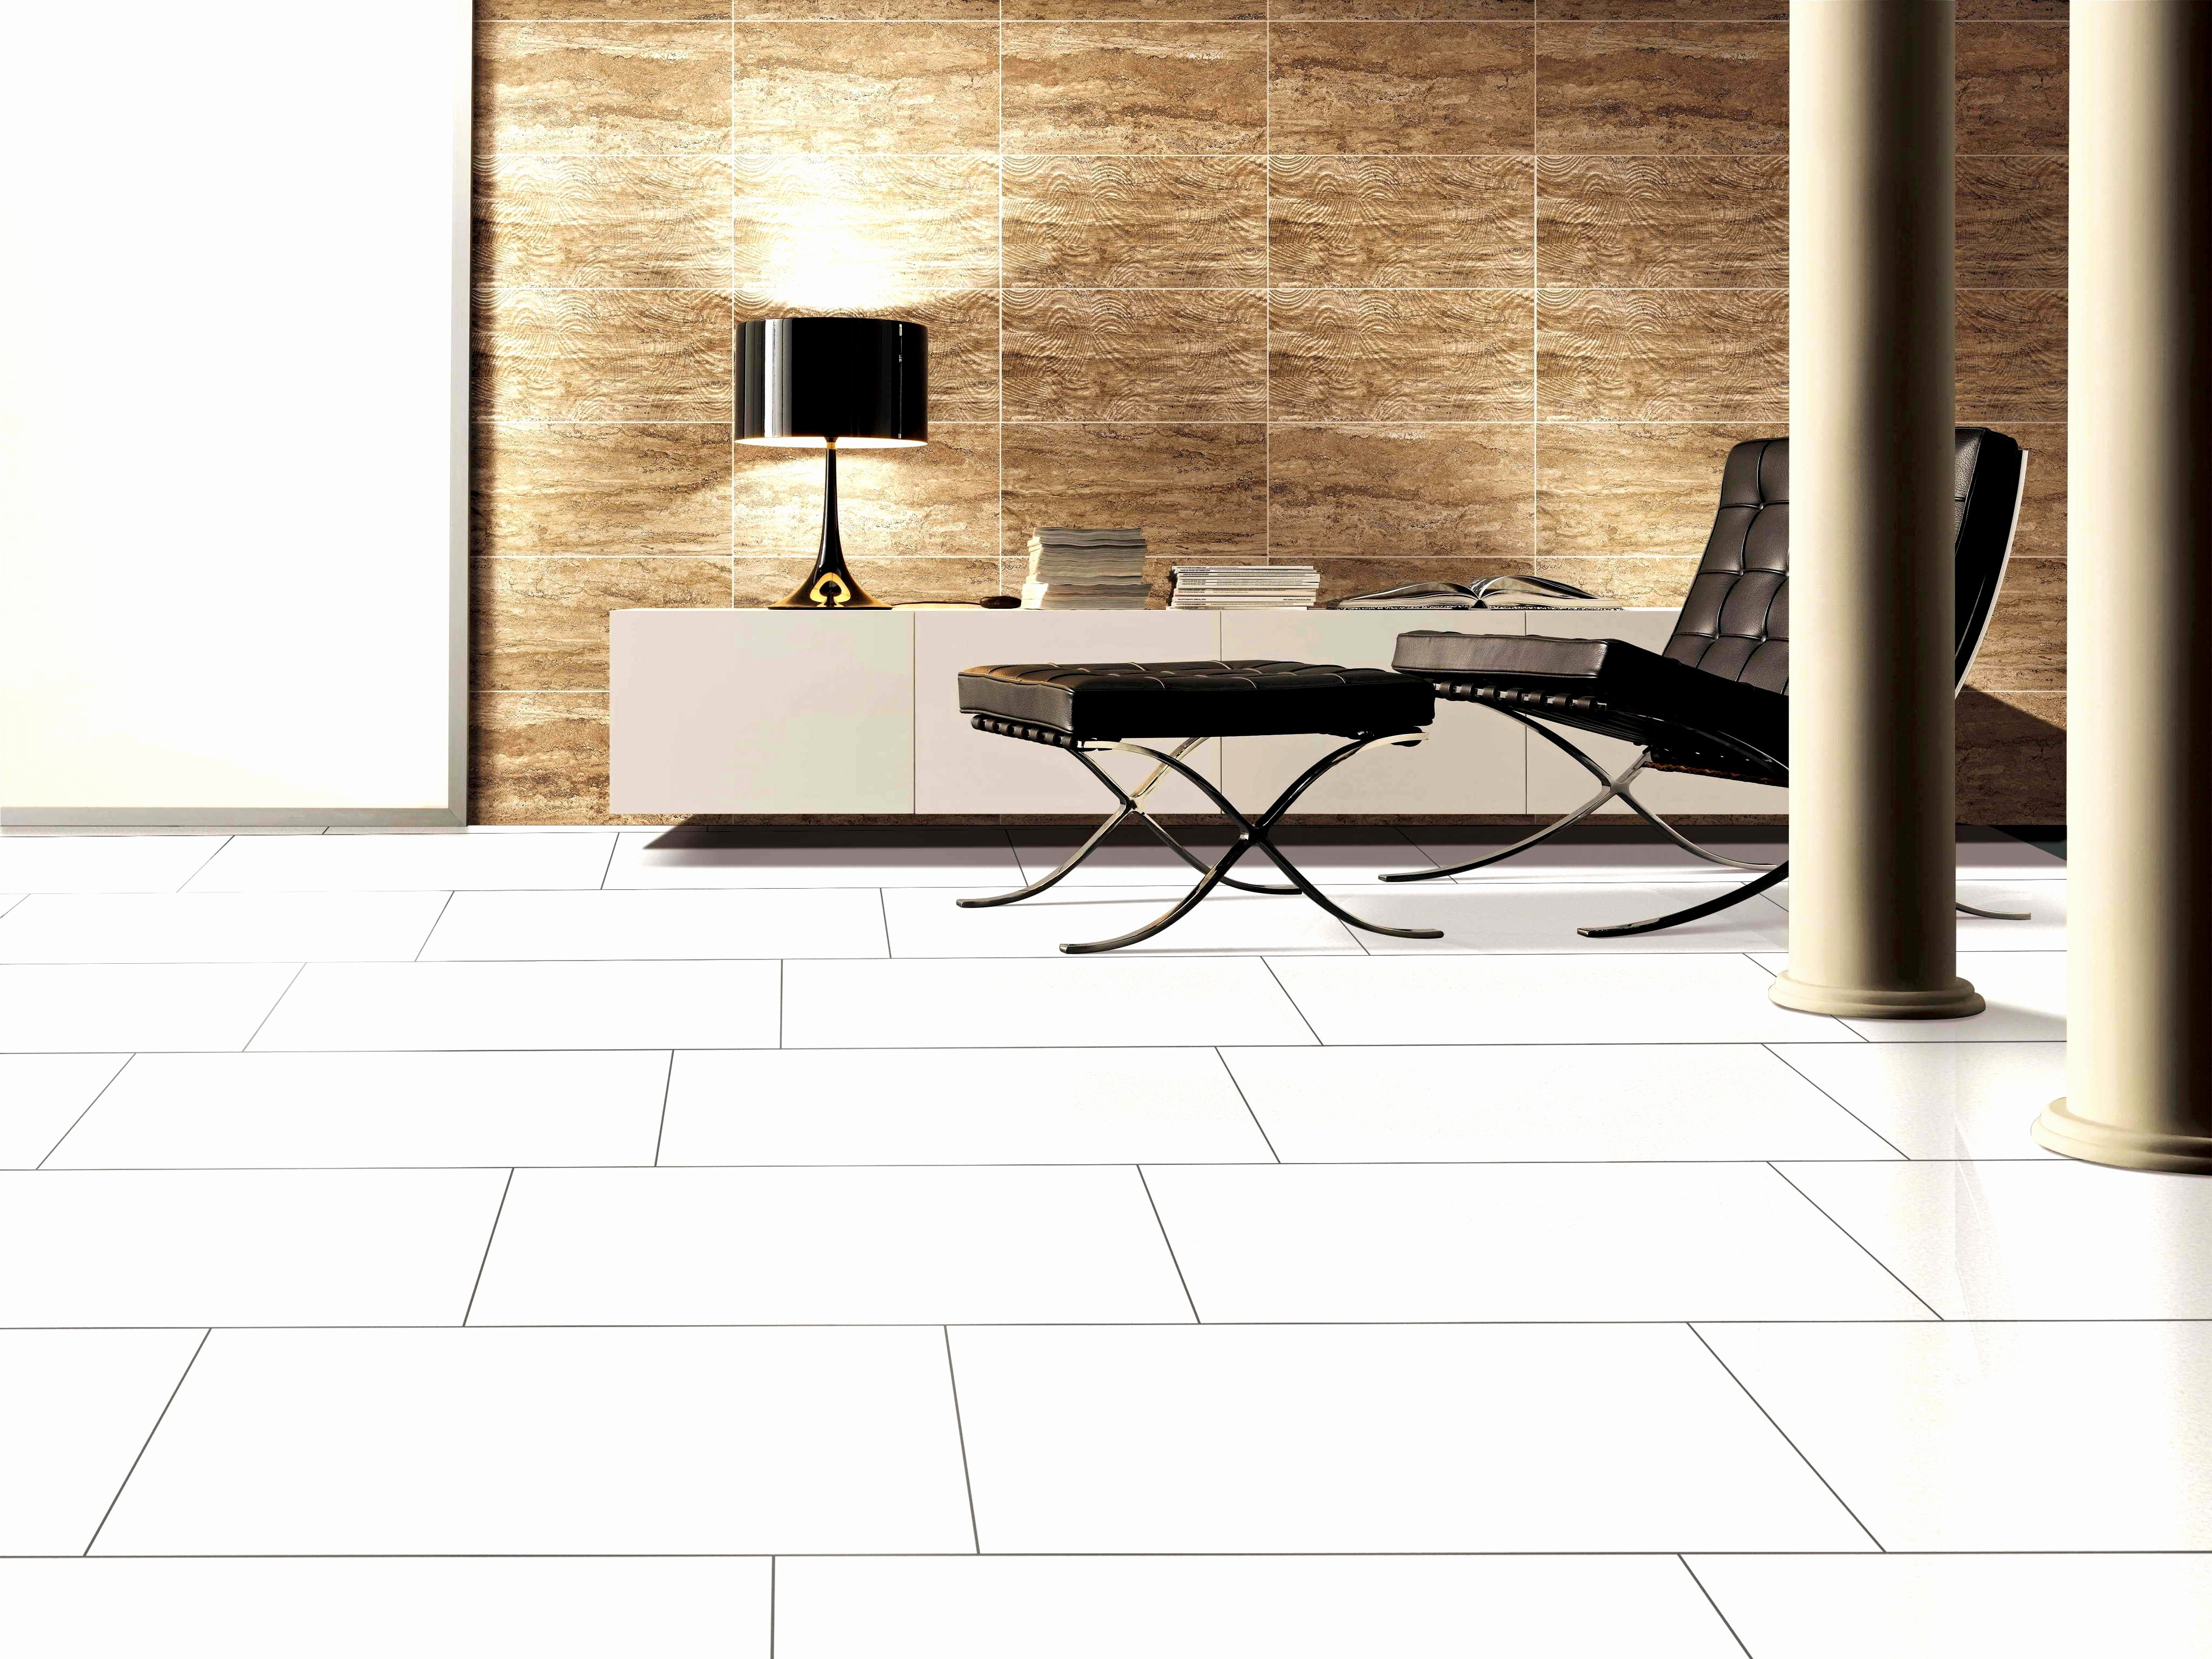 hardwood wood floor installation flooring jack of wood floor image beautiful flooring nj furniture design hard wood with flooring new 0d grace wood floor image new wood floor laminate best how to laminate a floor best